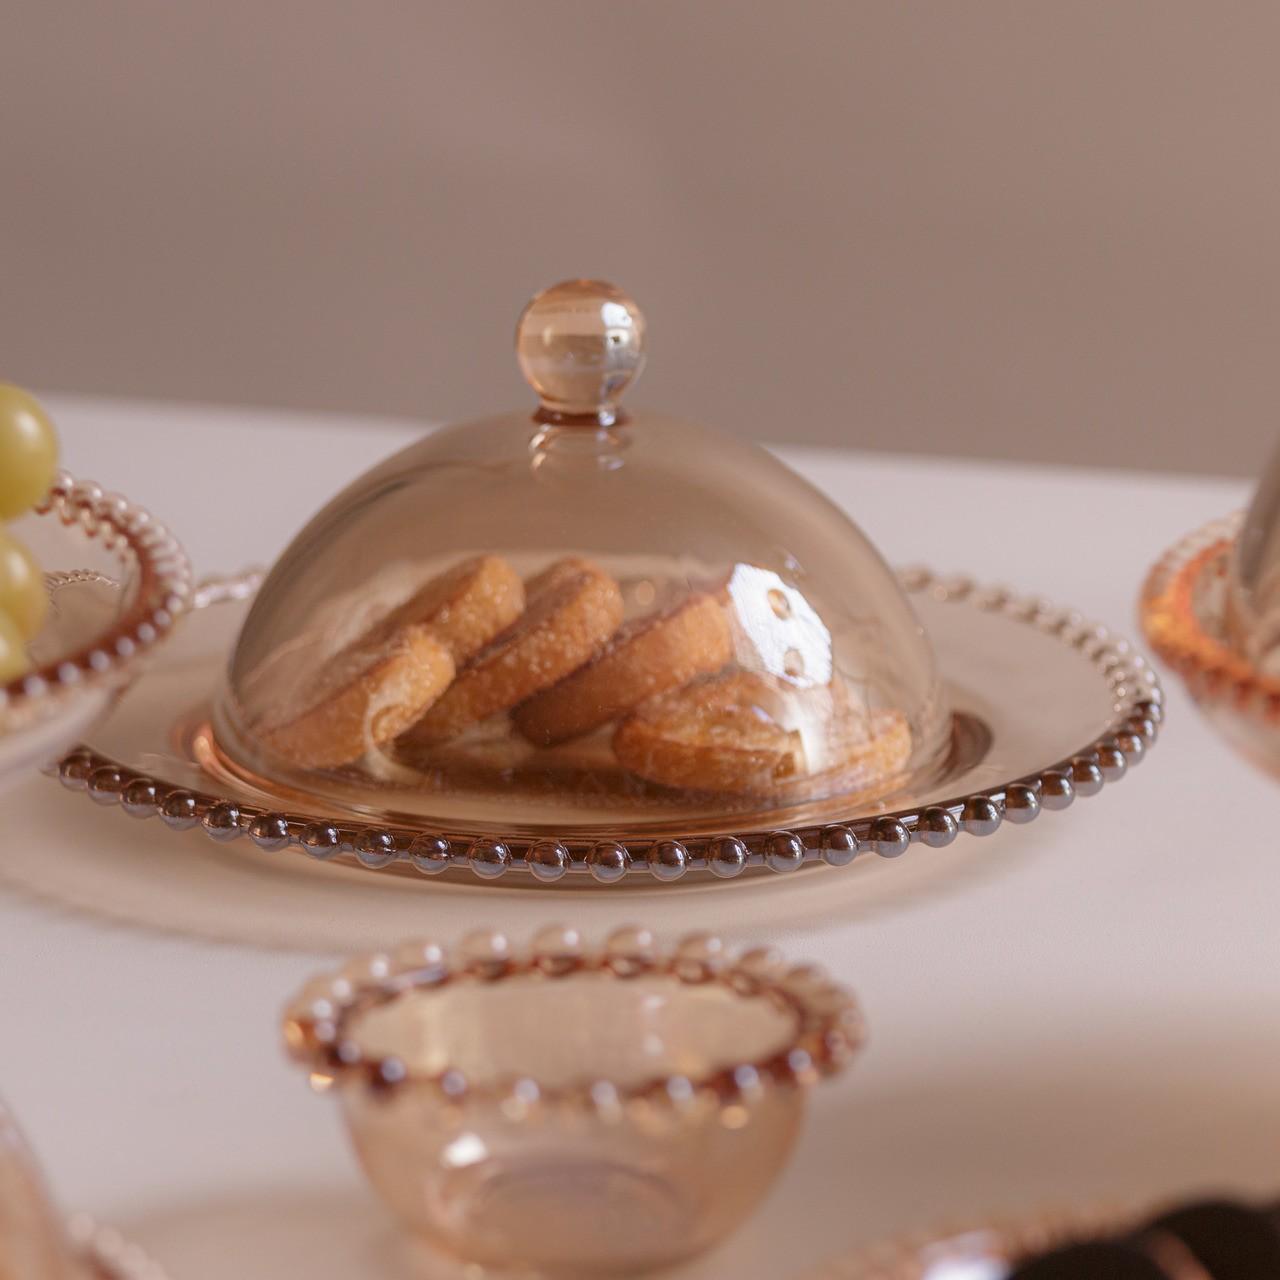 Queijeira 20 cm de cristal âmbar com tampa Pearl Wolff - 28267